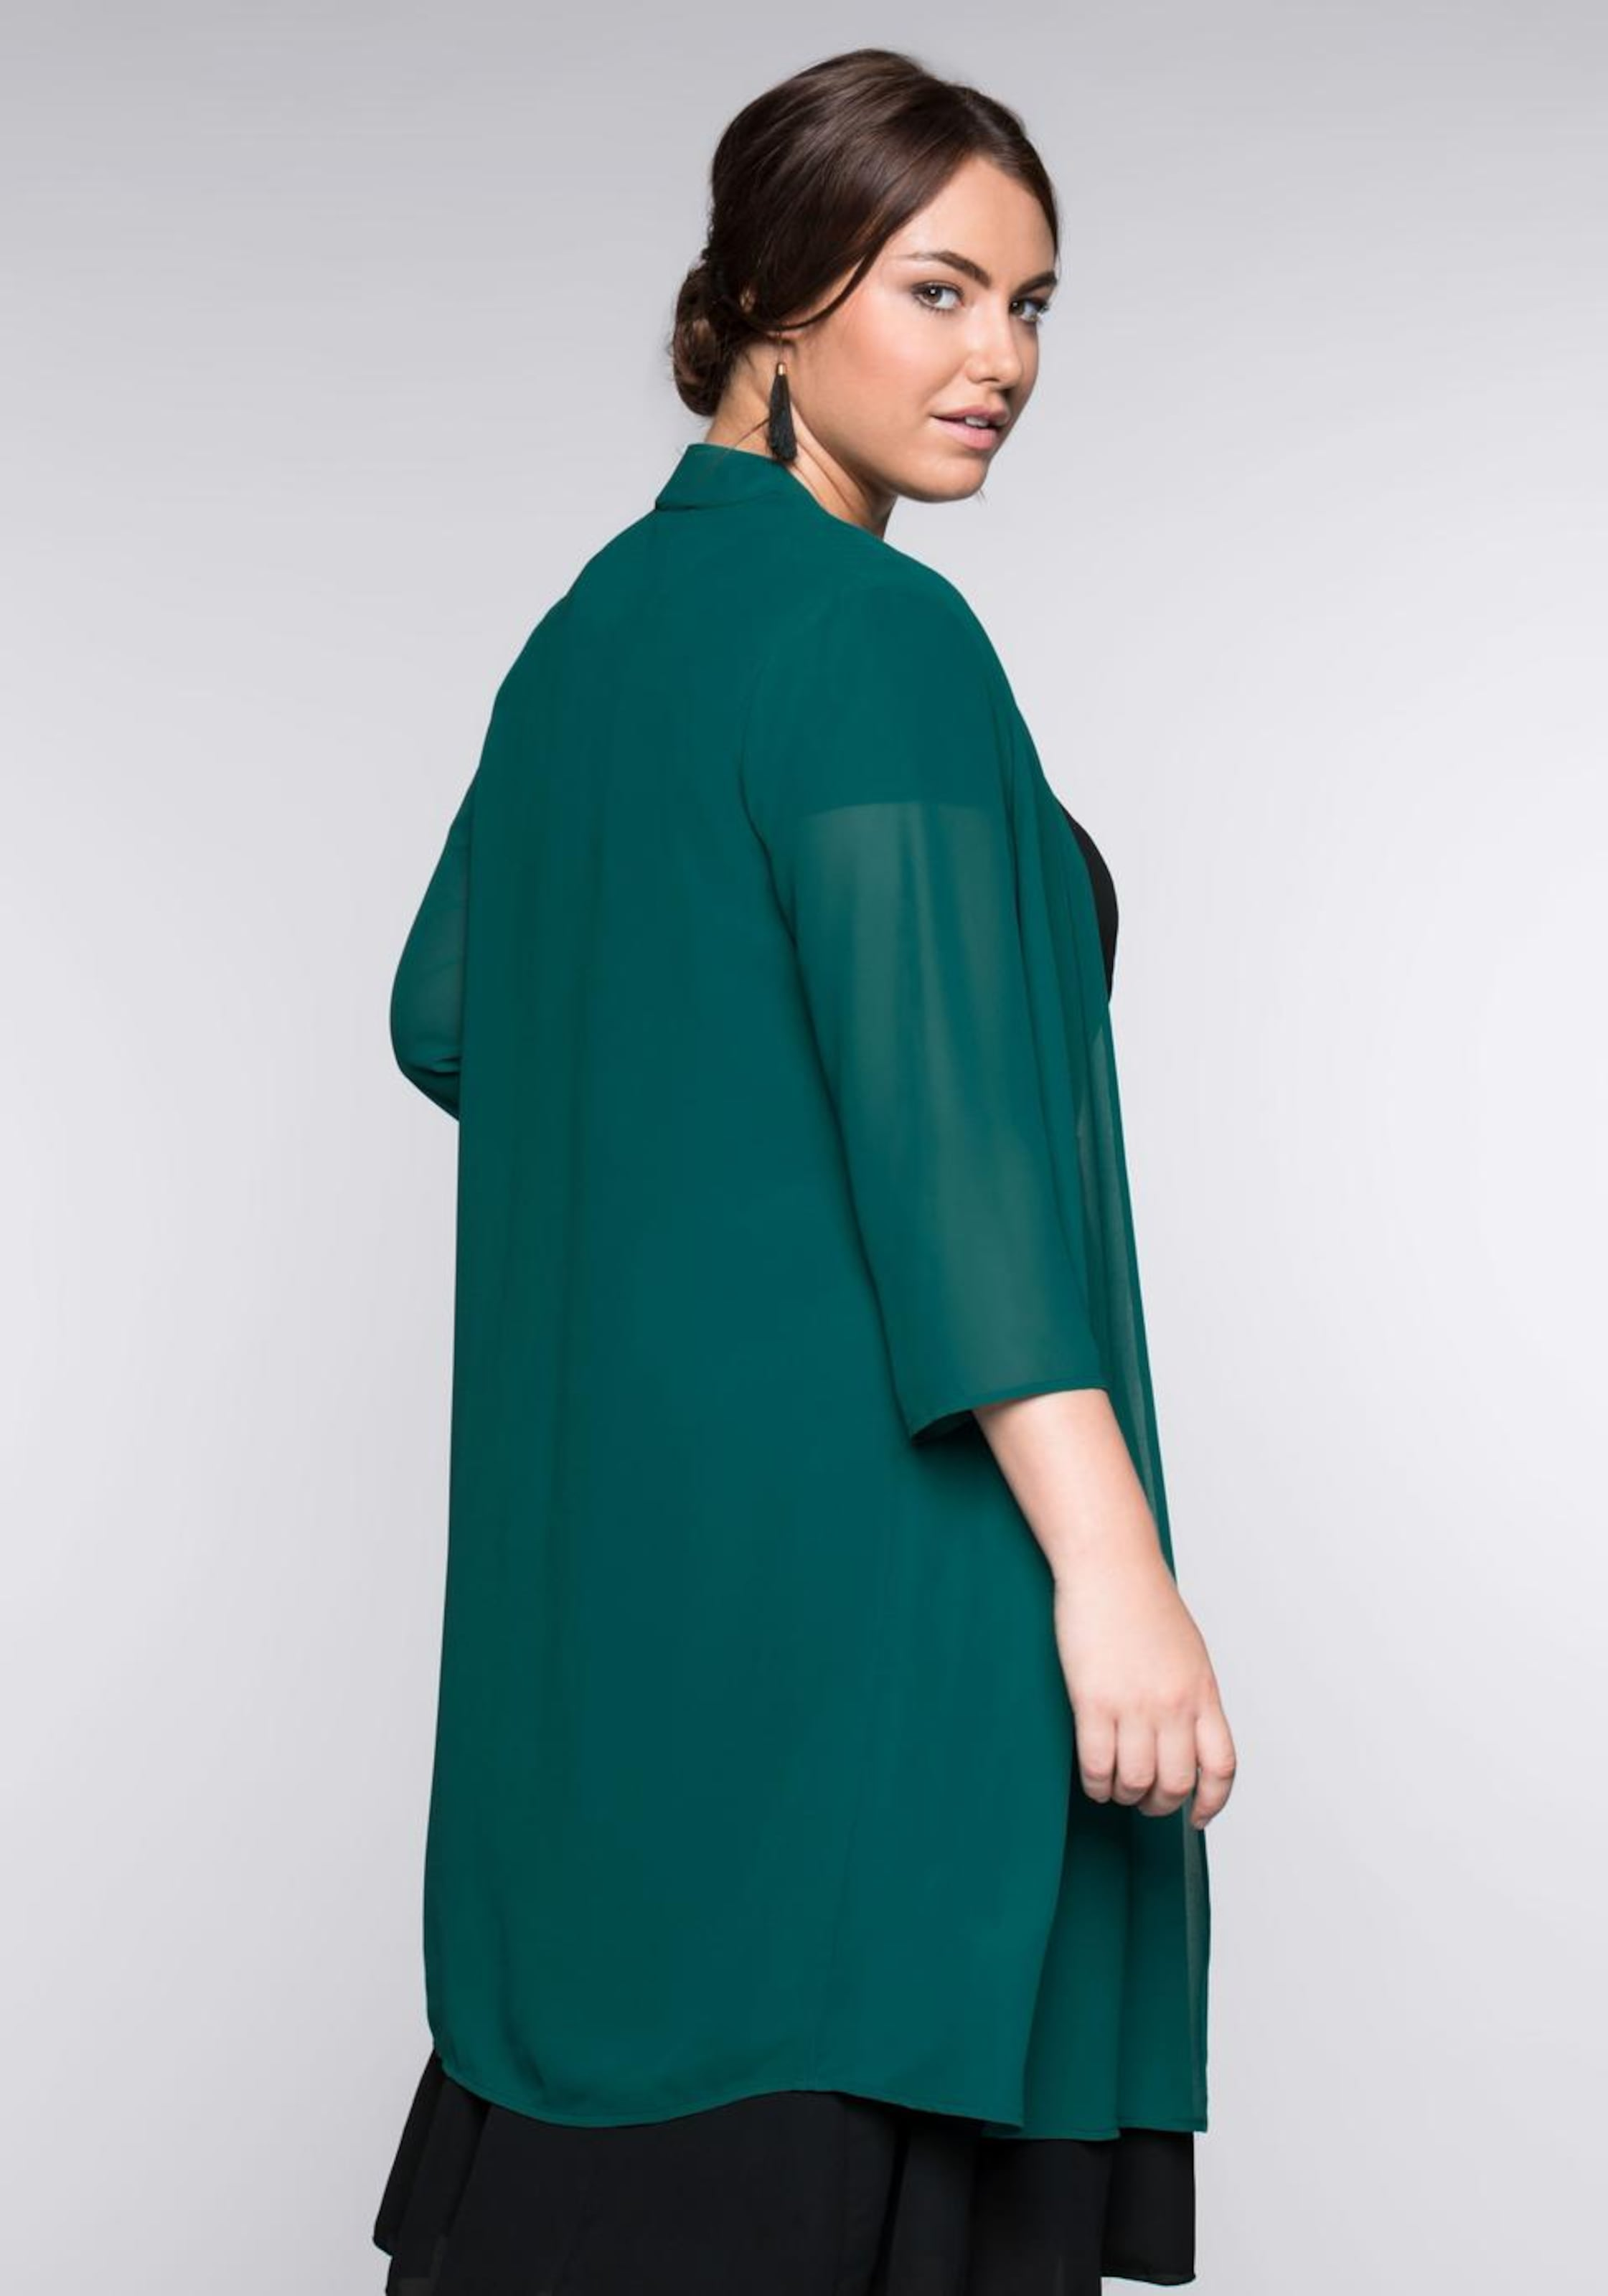 In Sheego Sheego Longbluse Style Smaragd 1KlJ3uTFc5